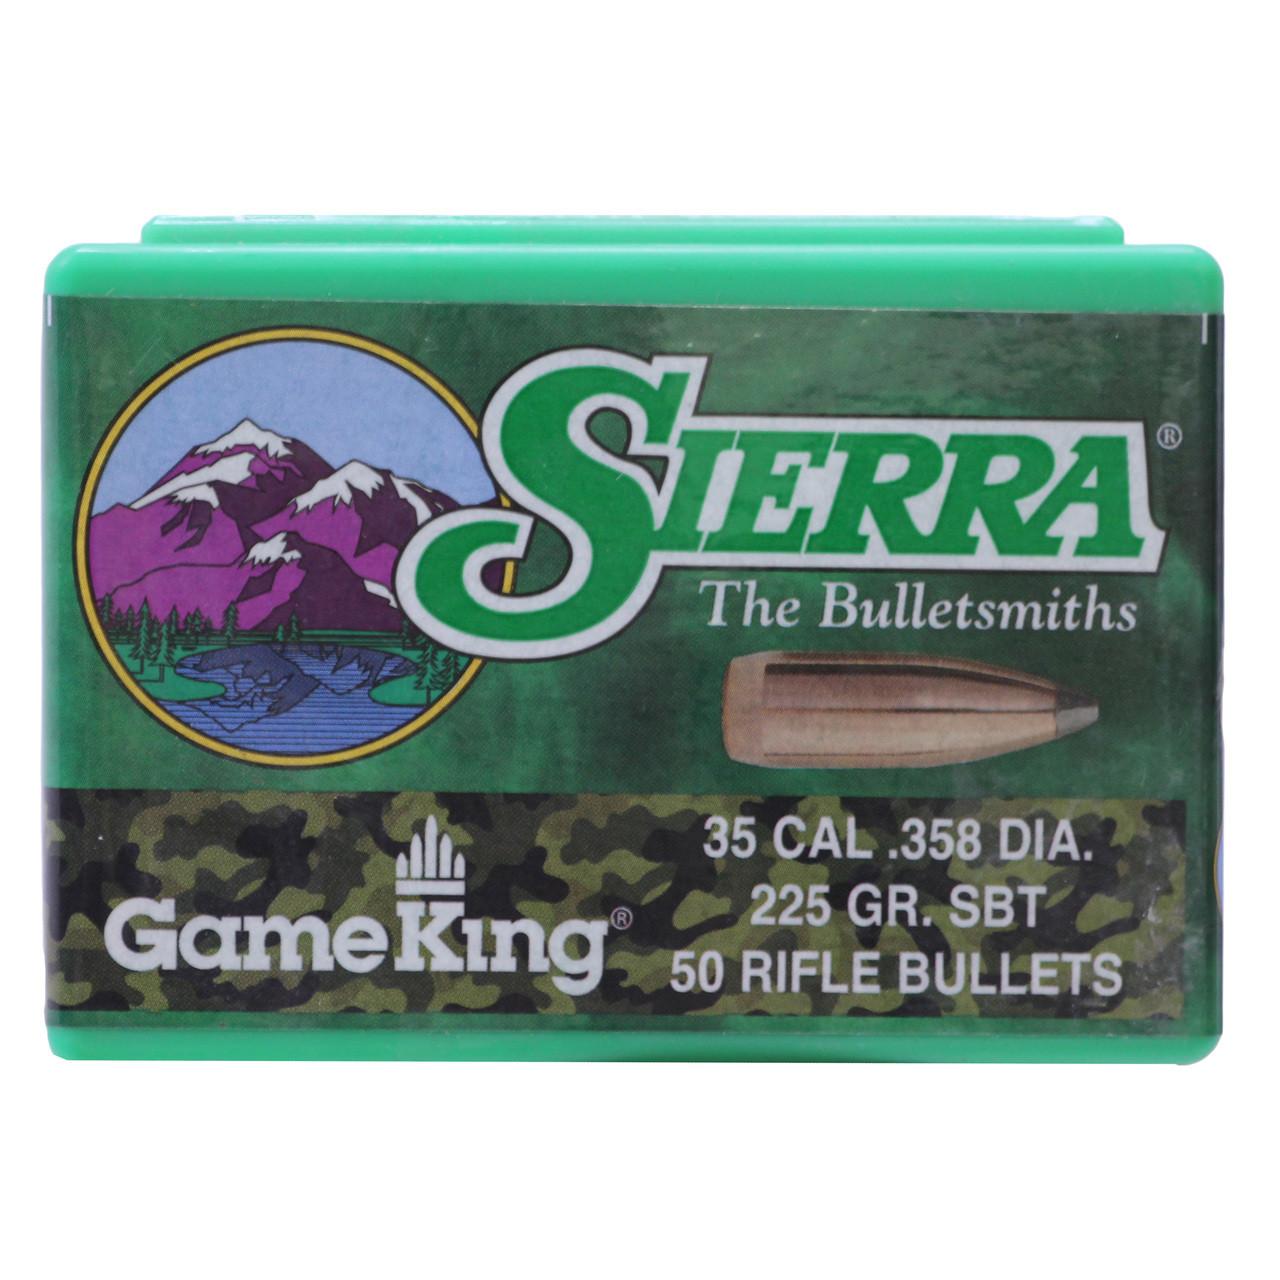 Sierra GameKing Bullets 35 Caliber (358 Diameter) 225 Grain Spitzer Boat  Tail Box of 50, UPC : 092763028506